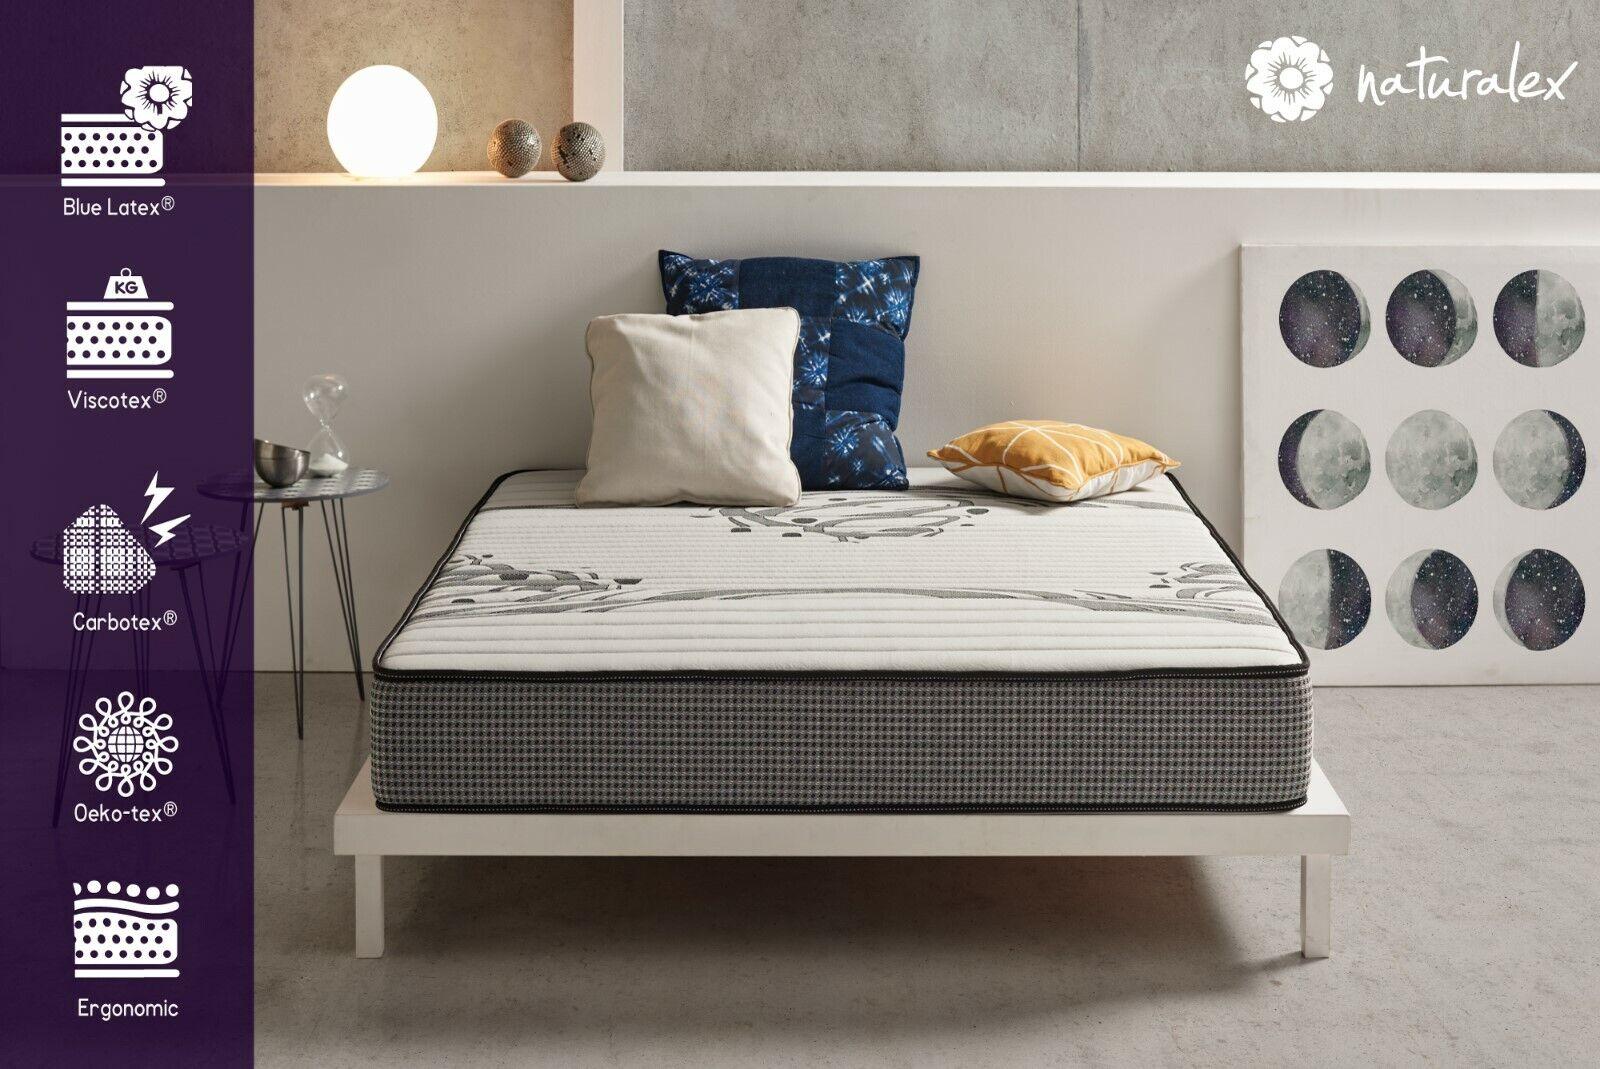 Naturalex   Pure Luxury Memory Foam Mattress 22cm Deep   Carbotex Fabric 7 Zones